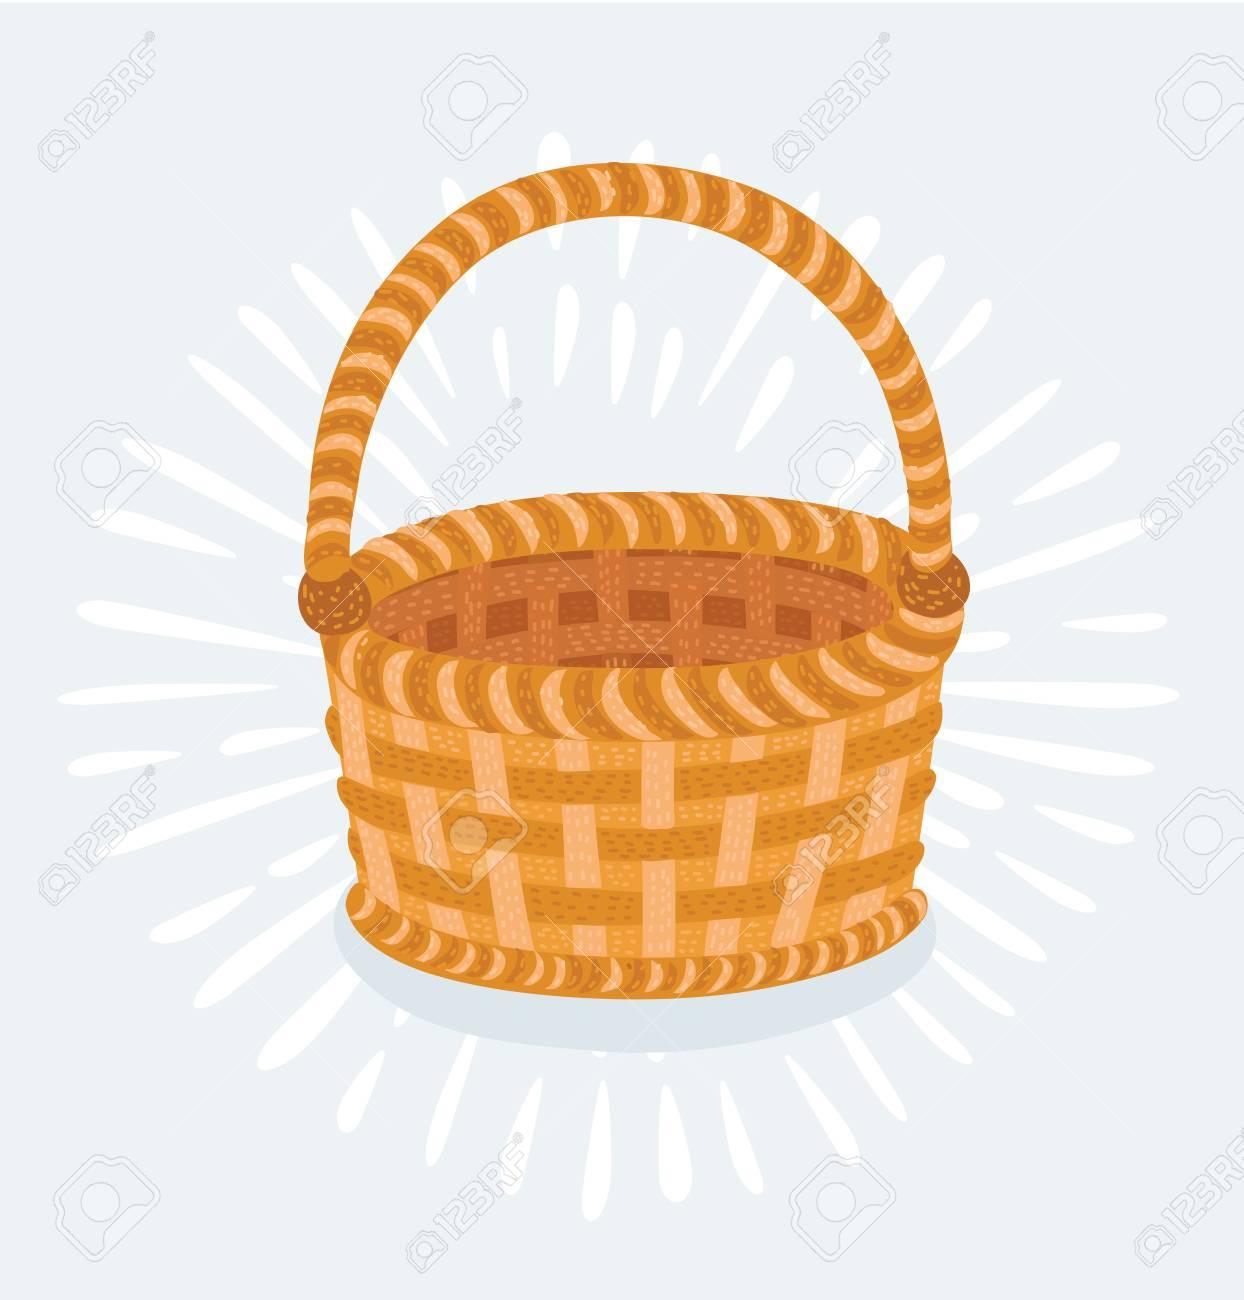 Vector cartoon illustration of Empty wicker basket isolated on...